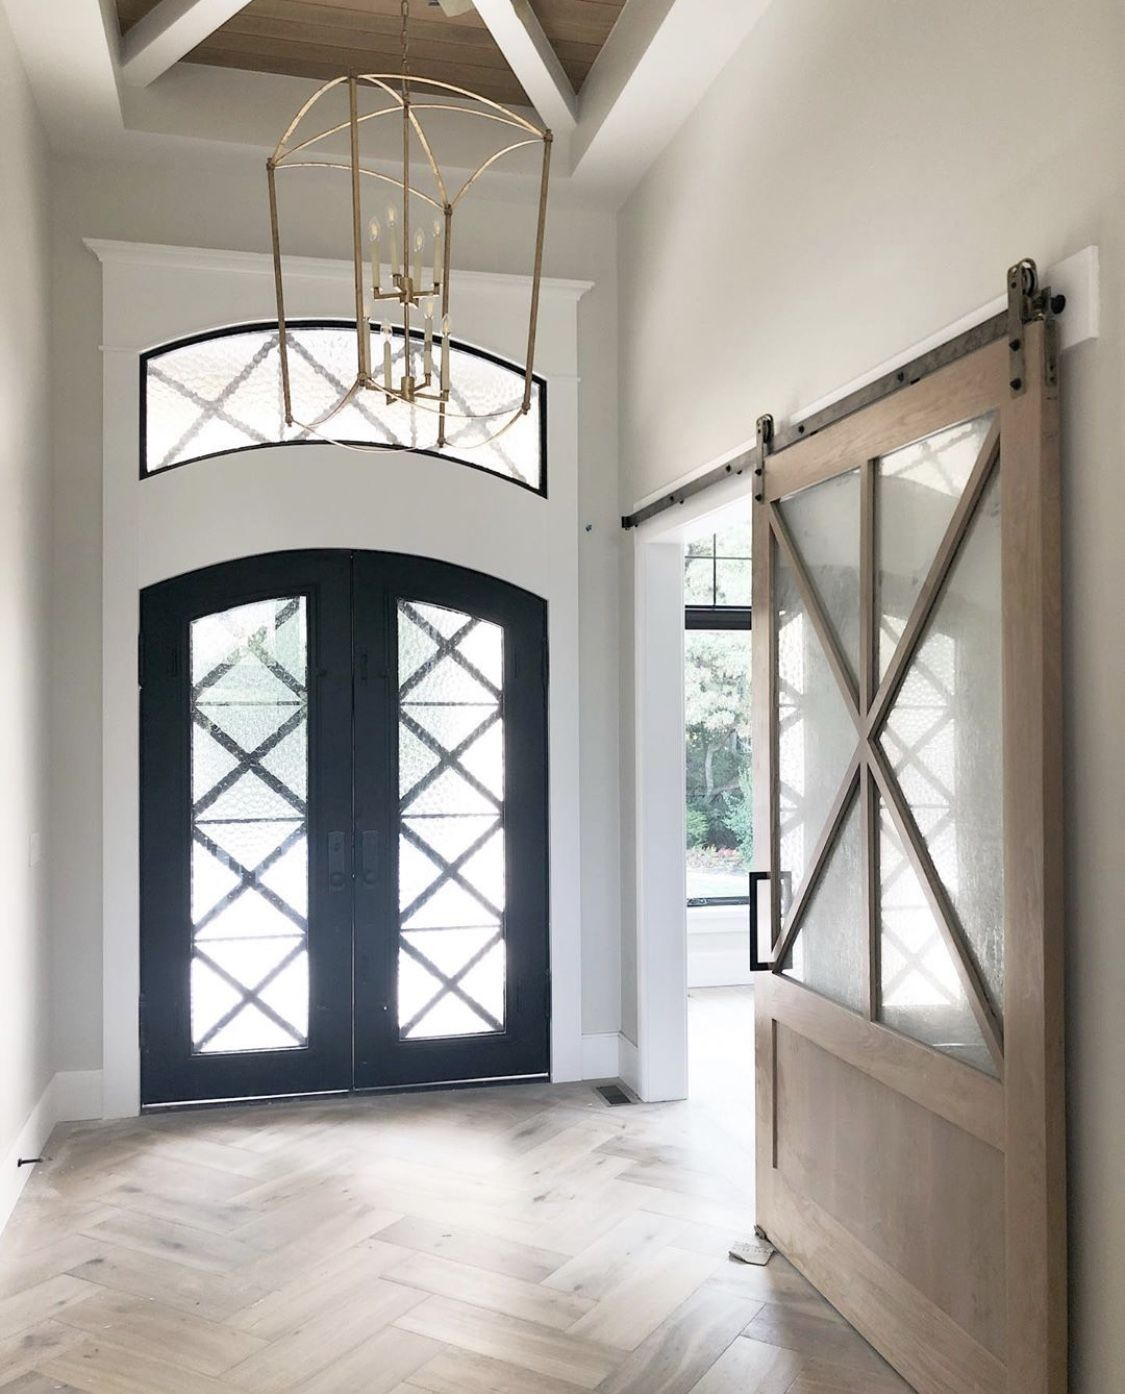 Entryway design entry way design home house interior